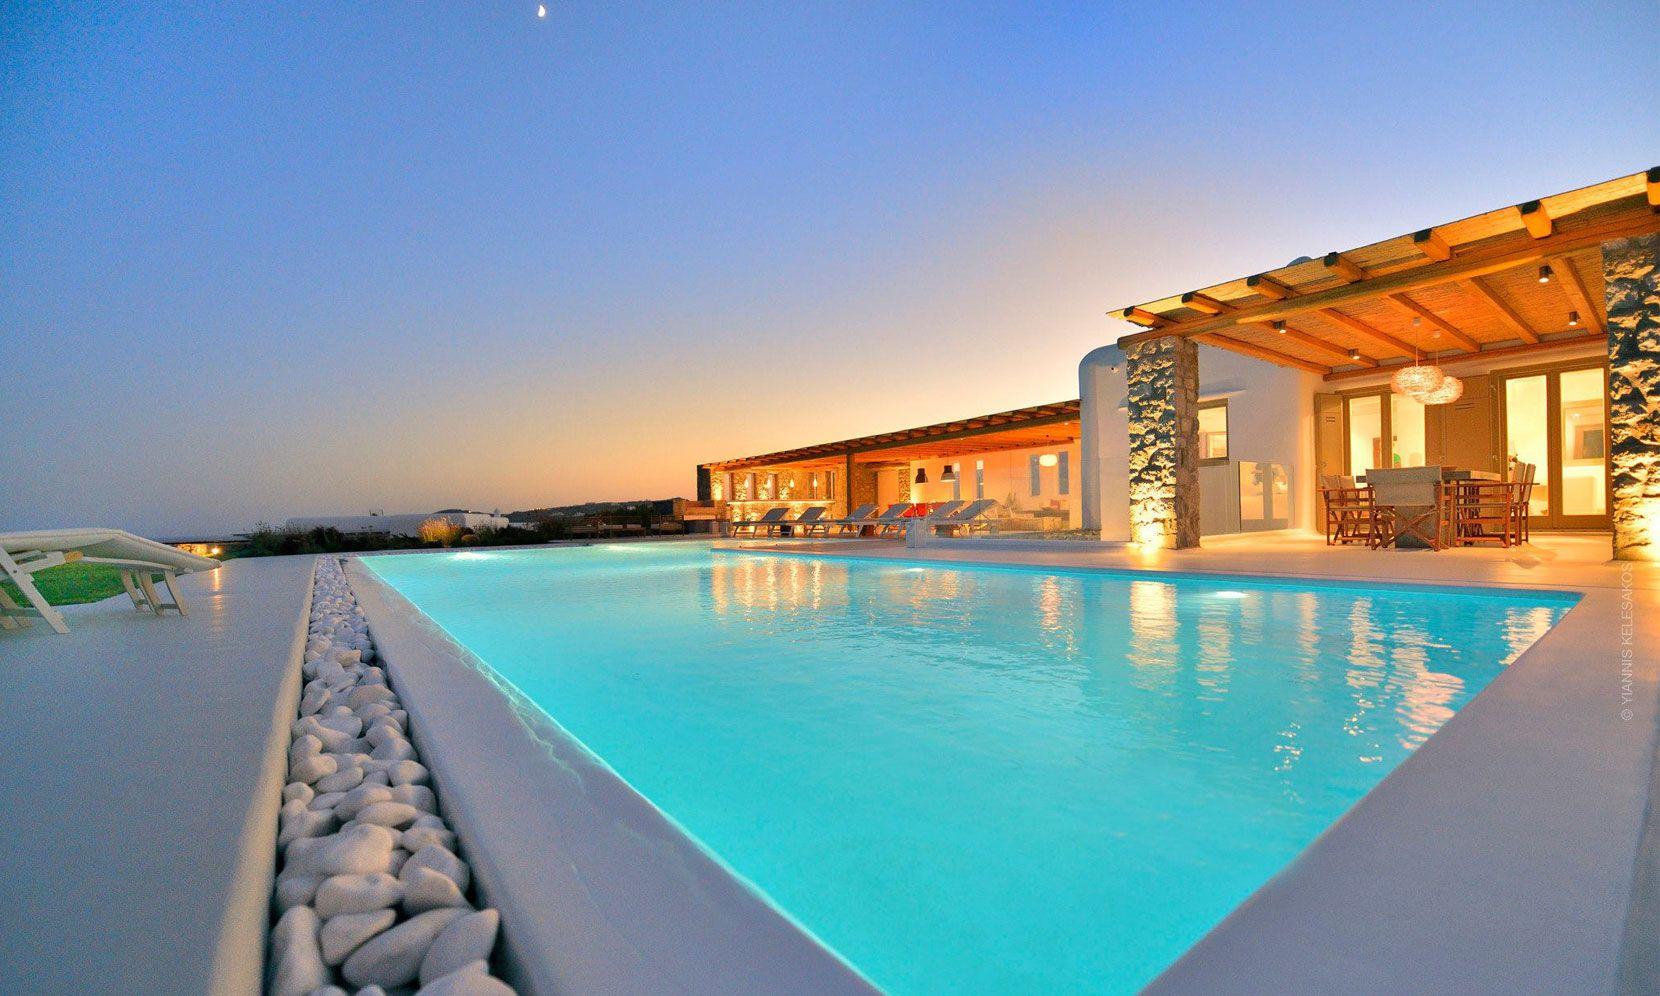 Mykonos Villa Zeus jumbotron image